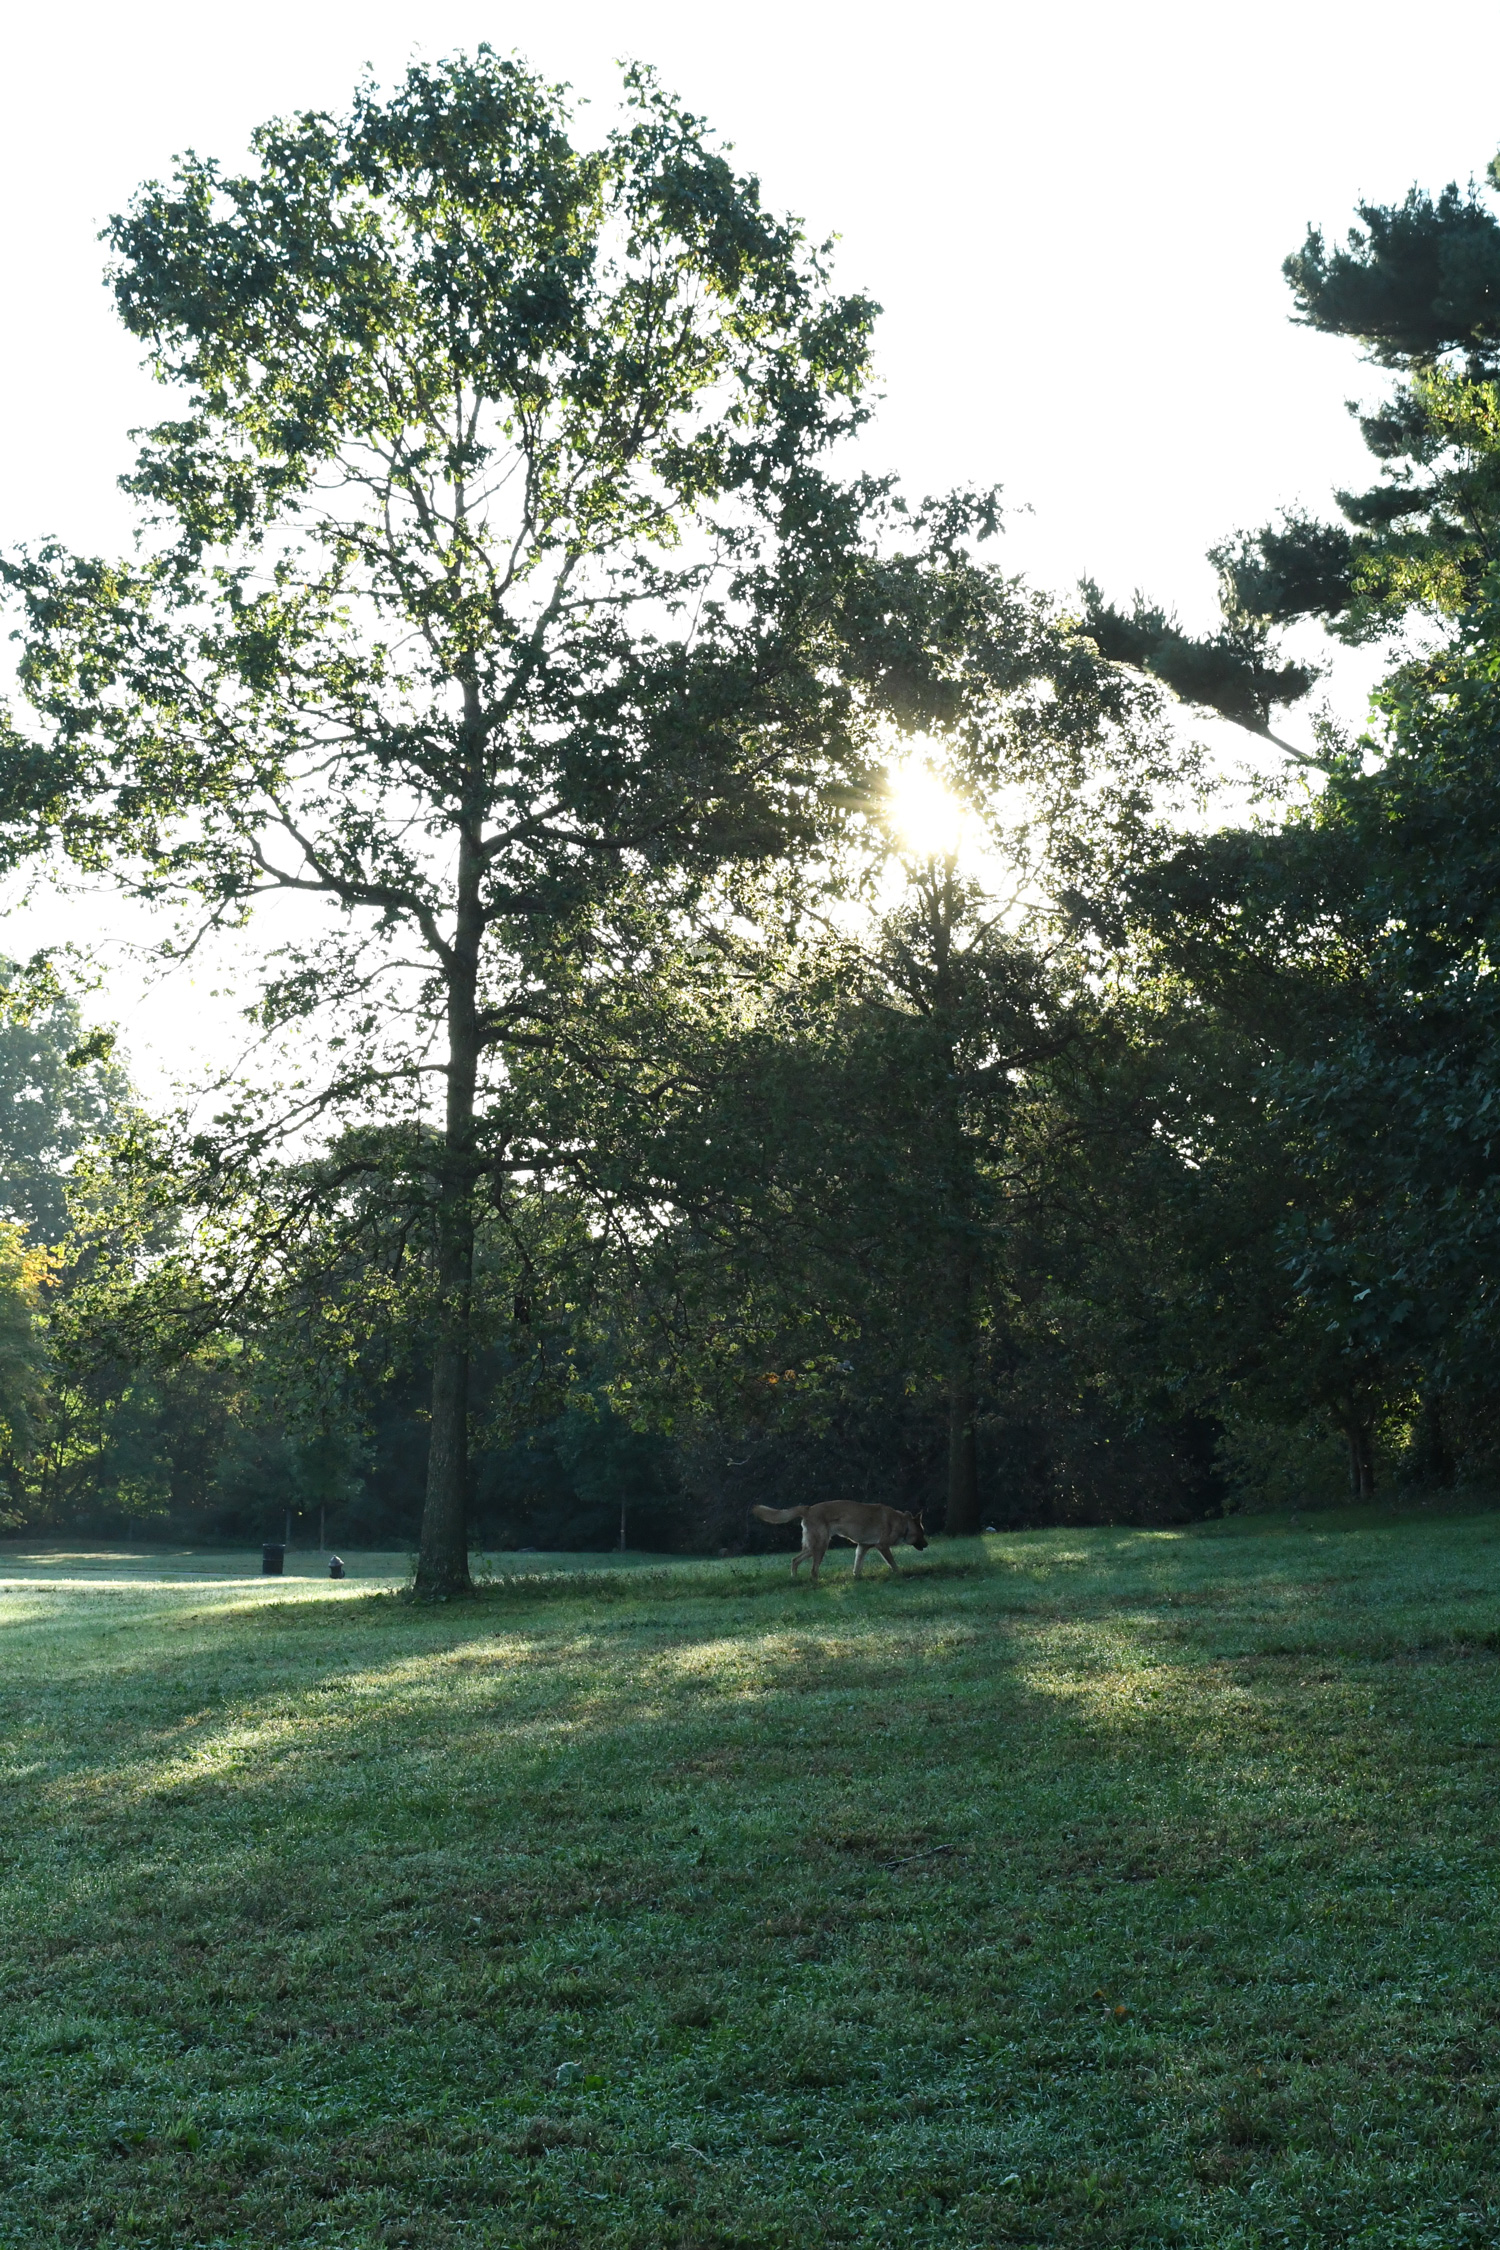 Morning walk, Prospect Park